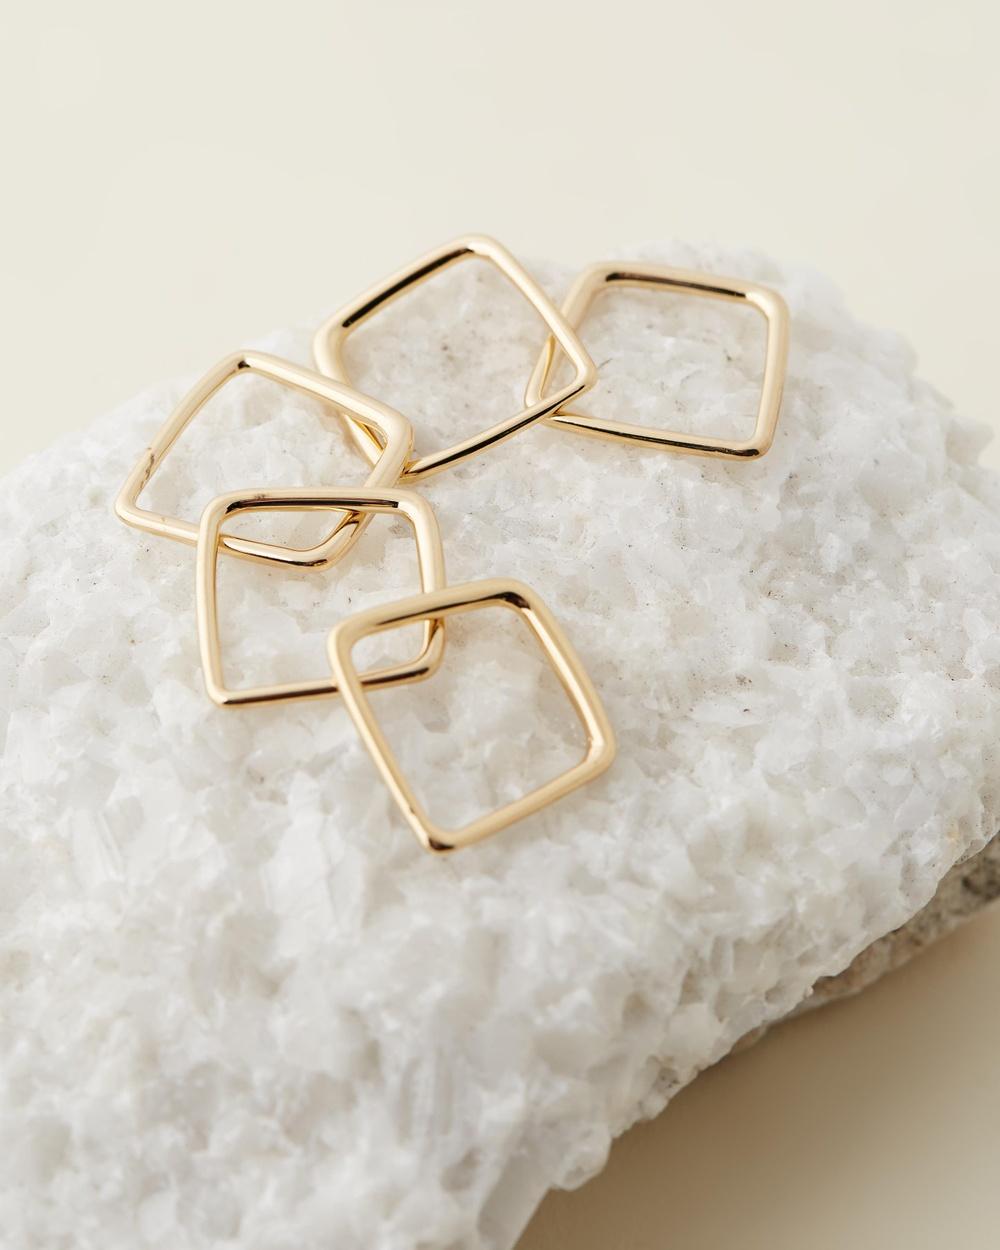 Soko Laini Stacking Rings Jewellery Gold